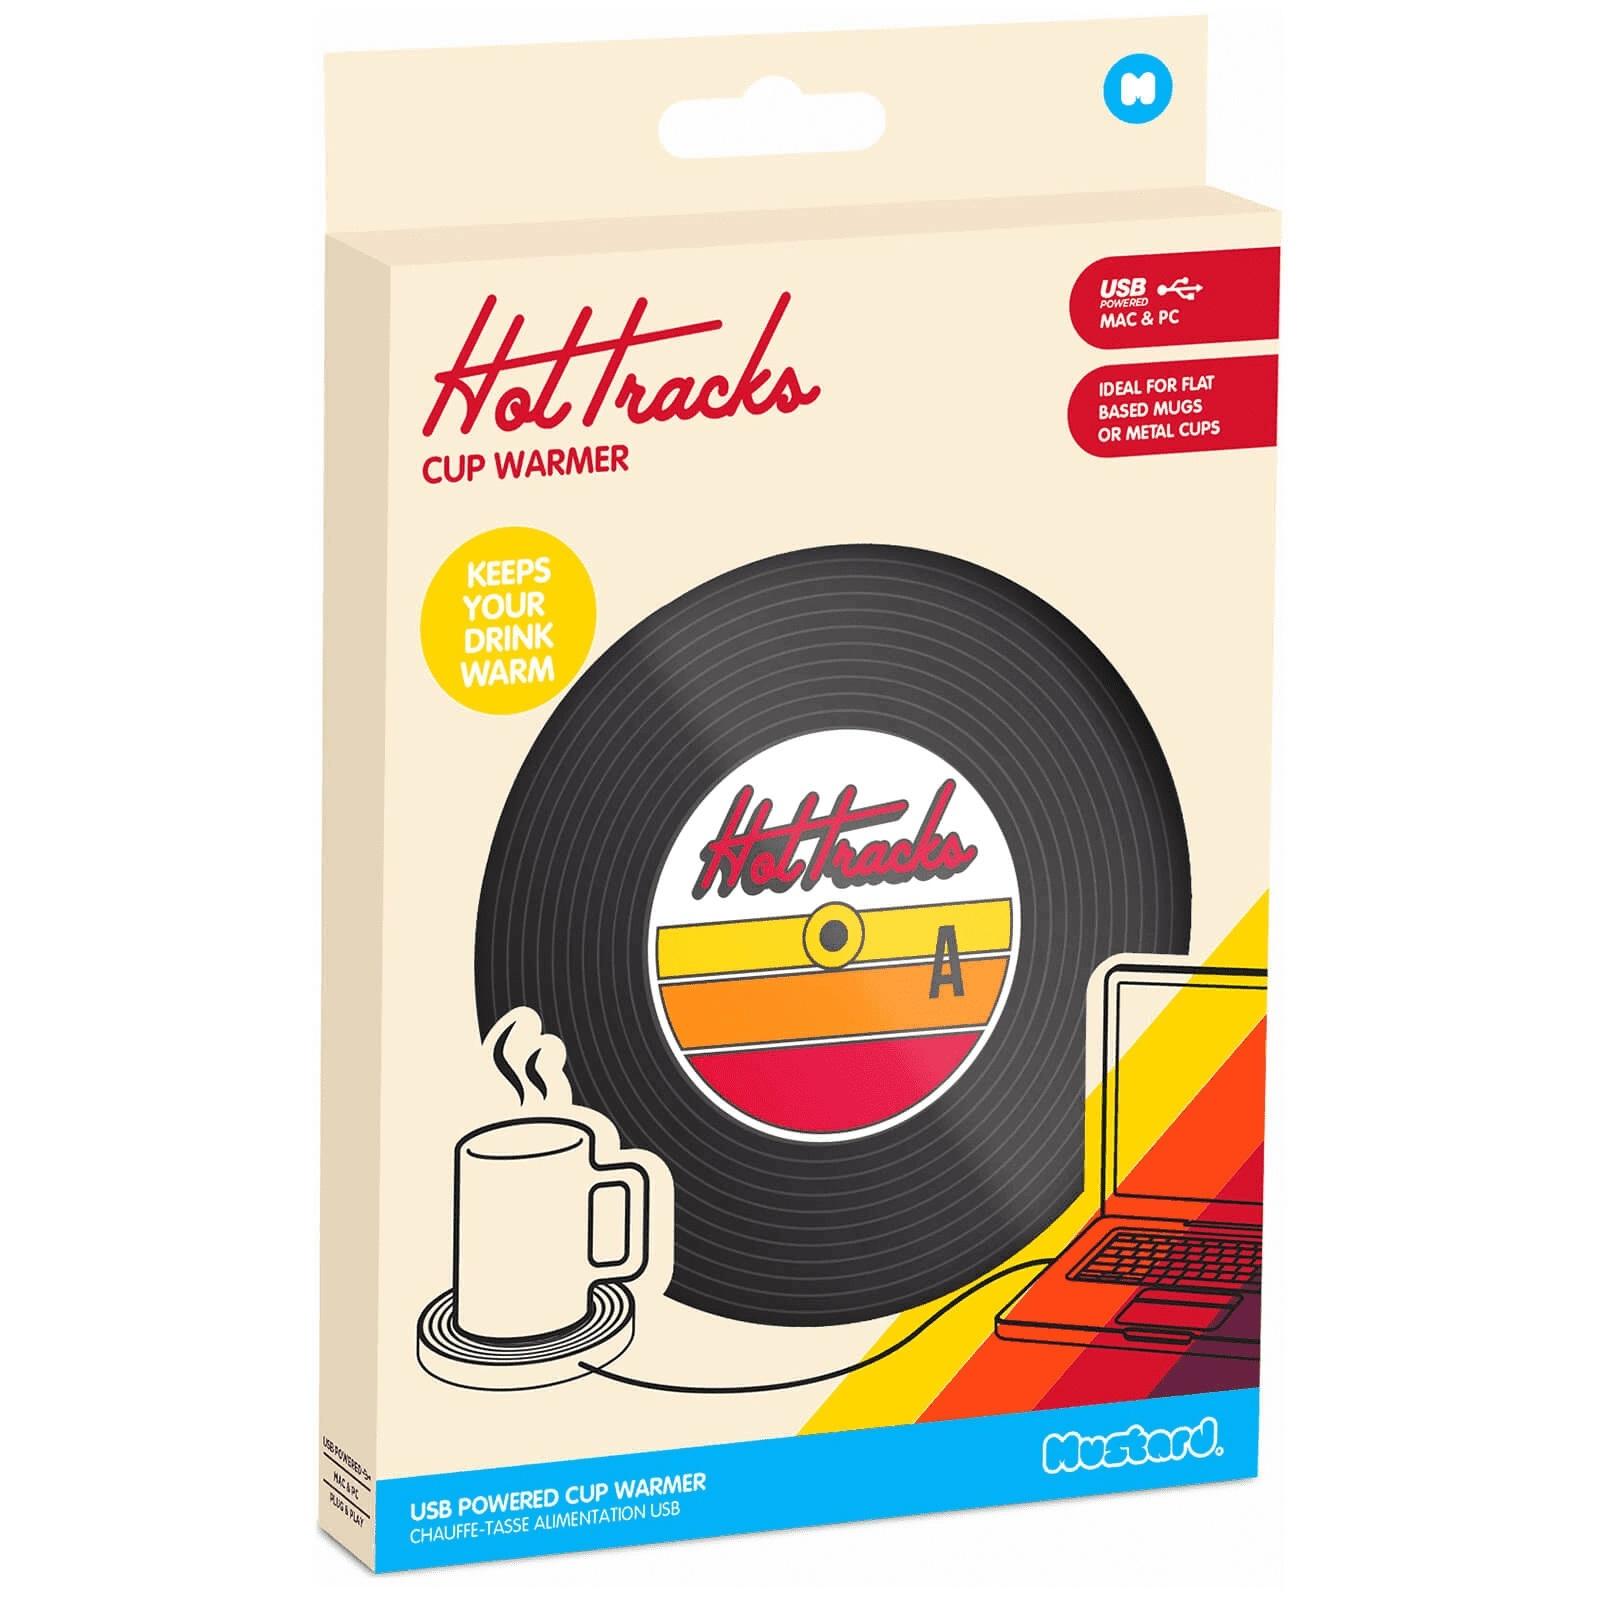 USB Hot Tracks Mug Warmer: Kitchenware